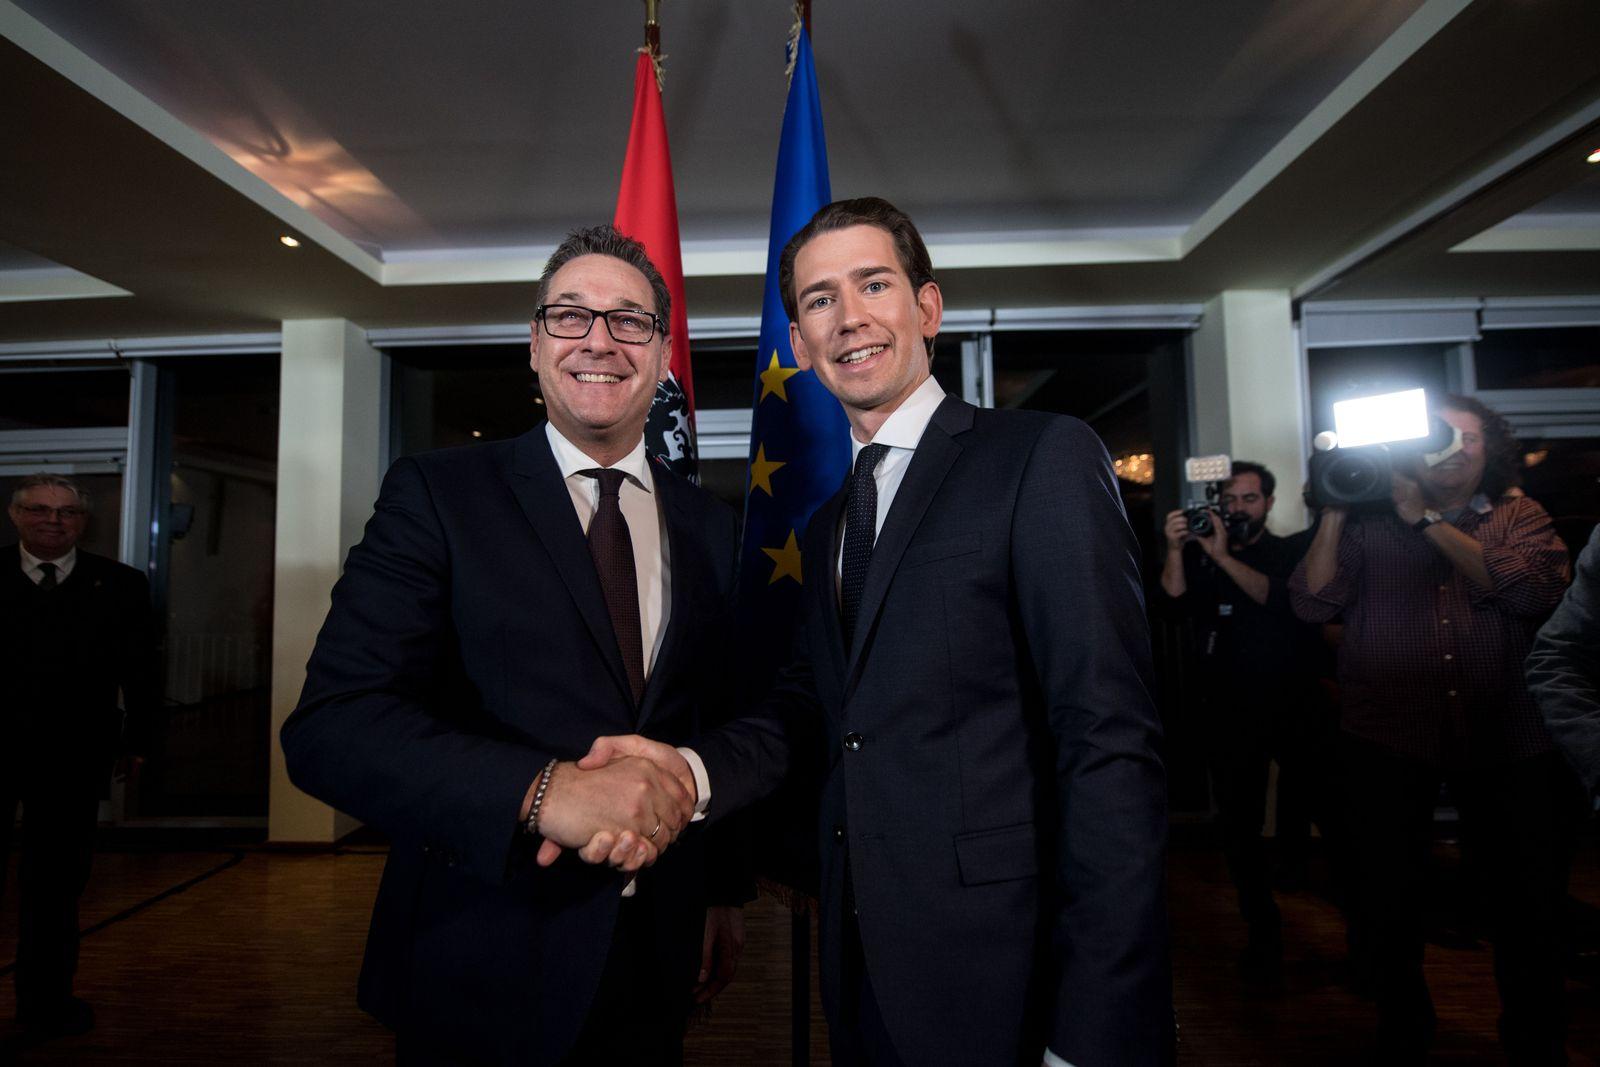 ÖVP/ FPÖ/ Sebastian Kurz/ Heinz-Christian Strache